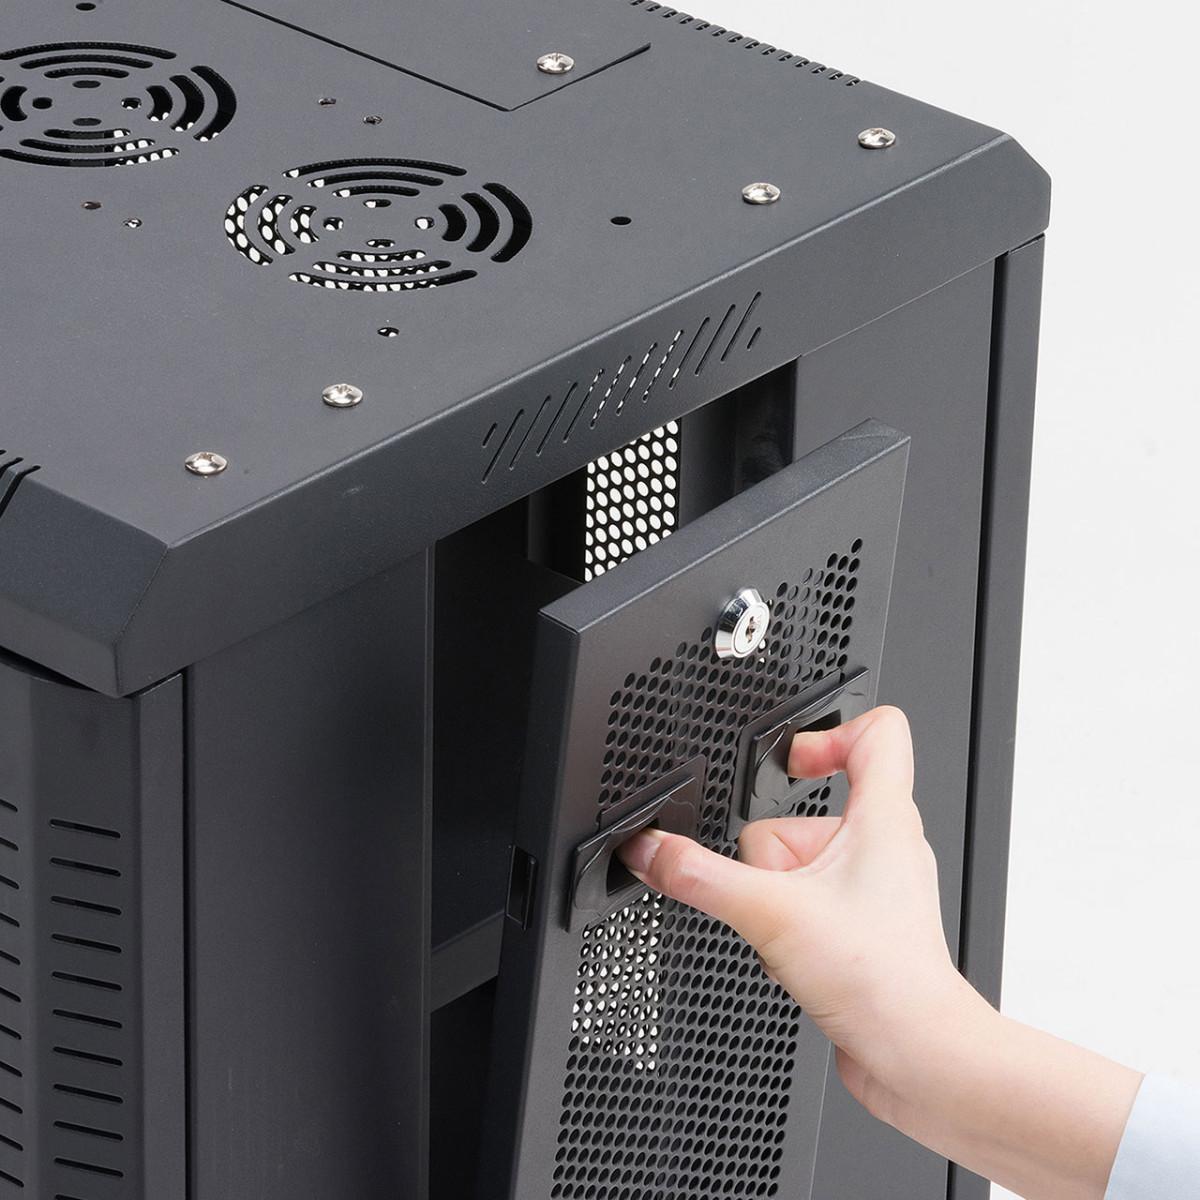 [CP-SVCMULT5] 【代引き不可】マルチ収納ラック (W450xD420xH700mm) 鍵付き